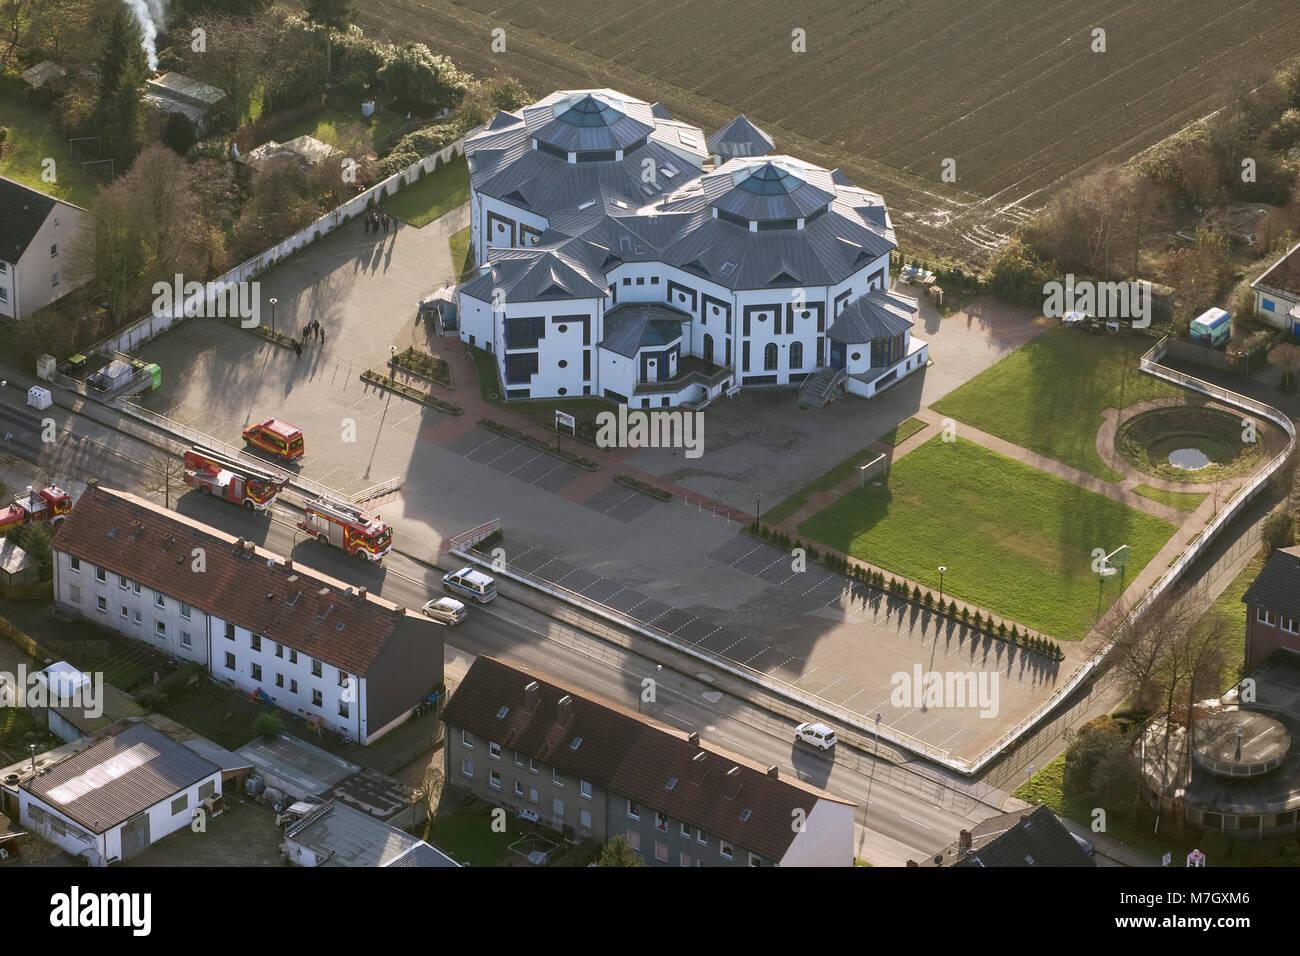 Aerial view, Herten Mosque, Paschenbergstrasse, Center for Education and Integration Herten, Herten, Ruhr area, - Stock Image